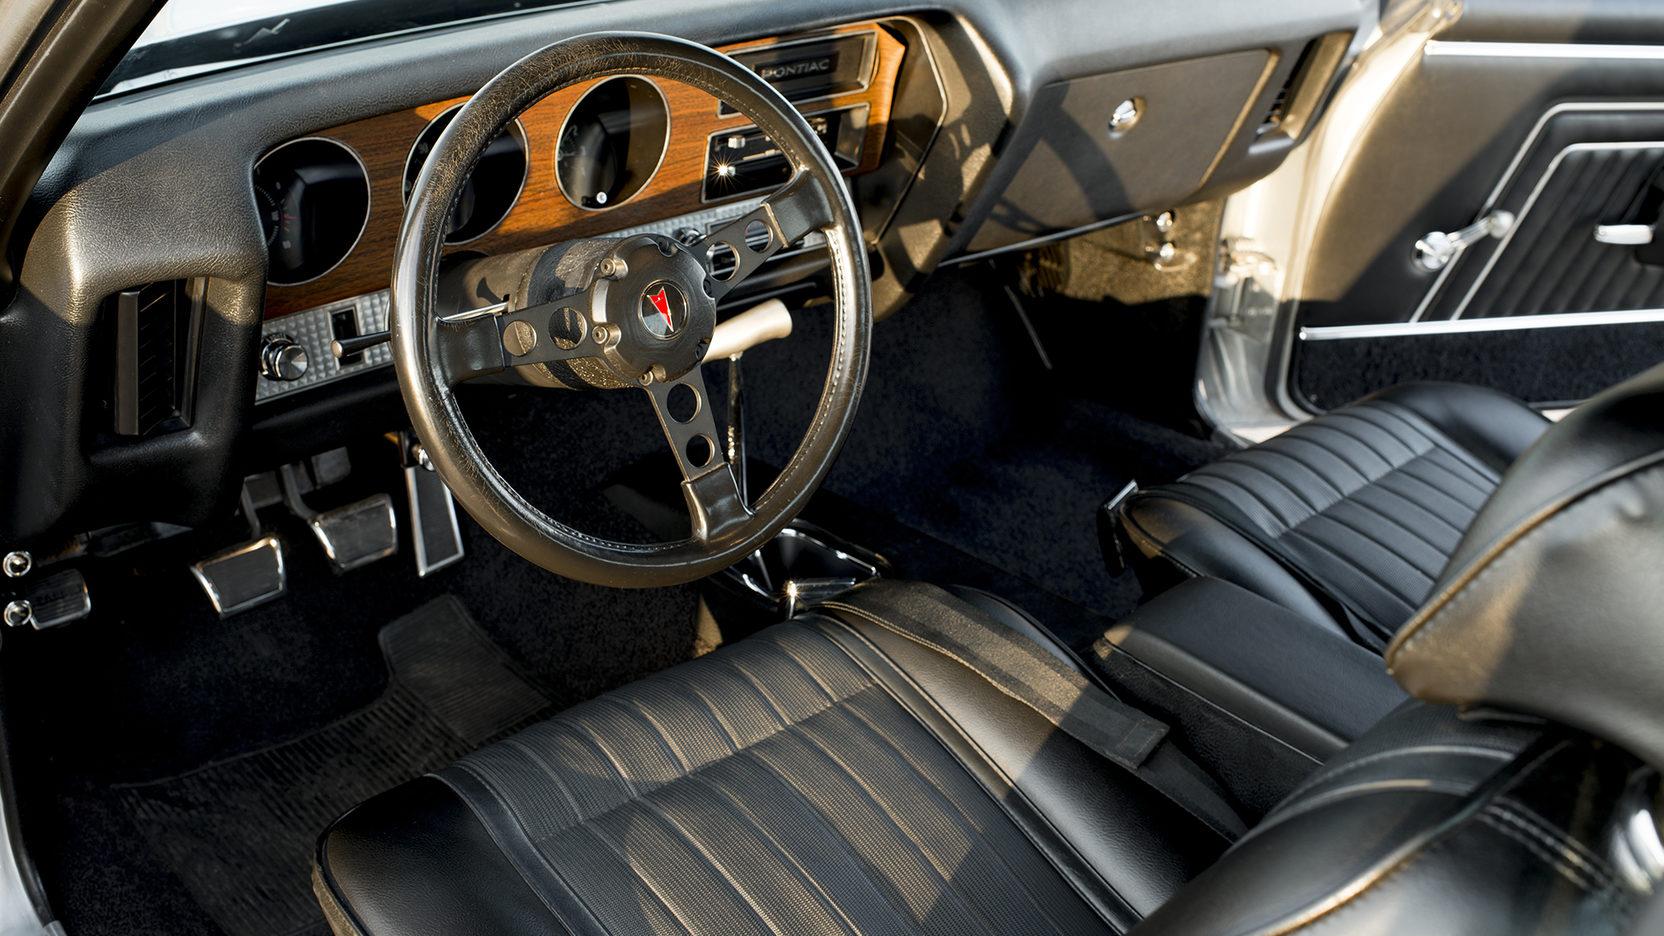 1970 Pontiac GTO Ram Air IV steering wheel interior